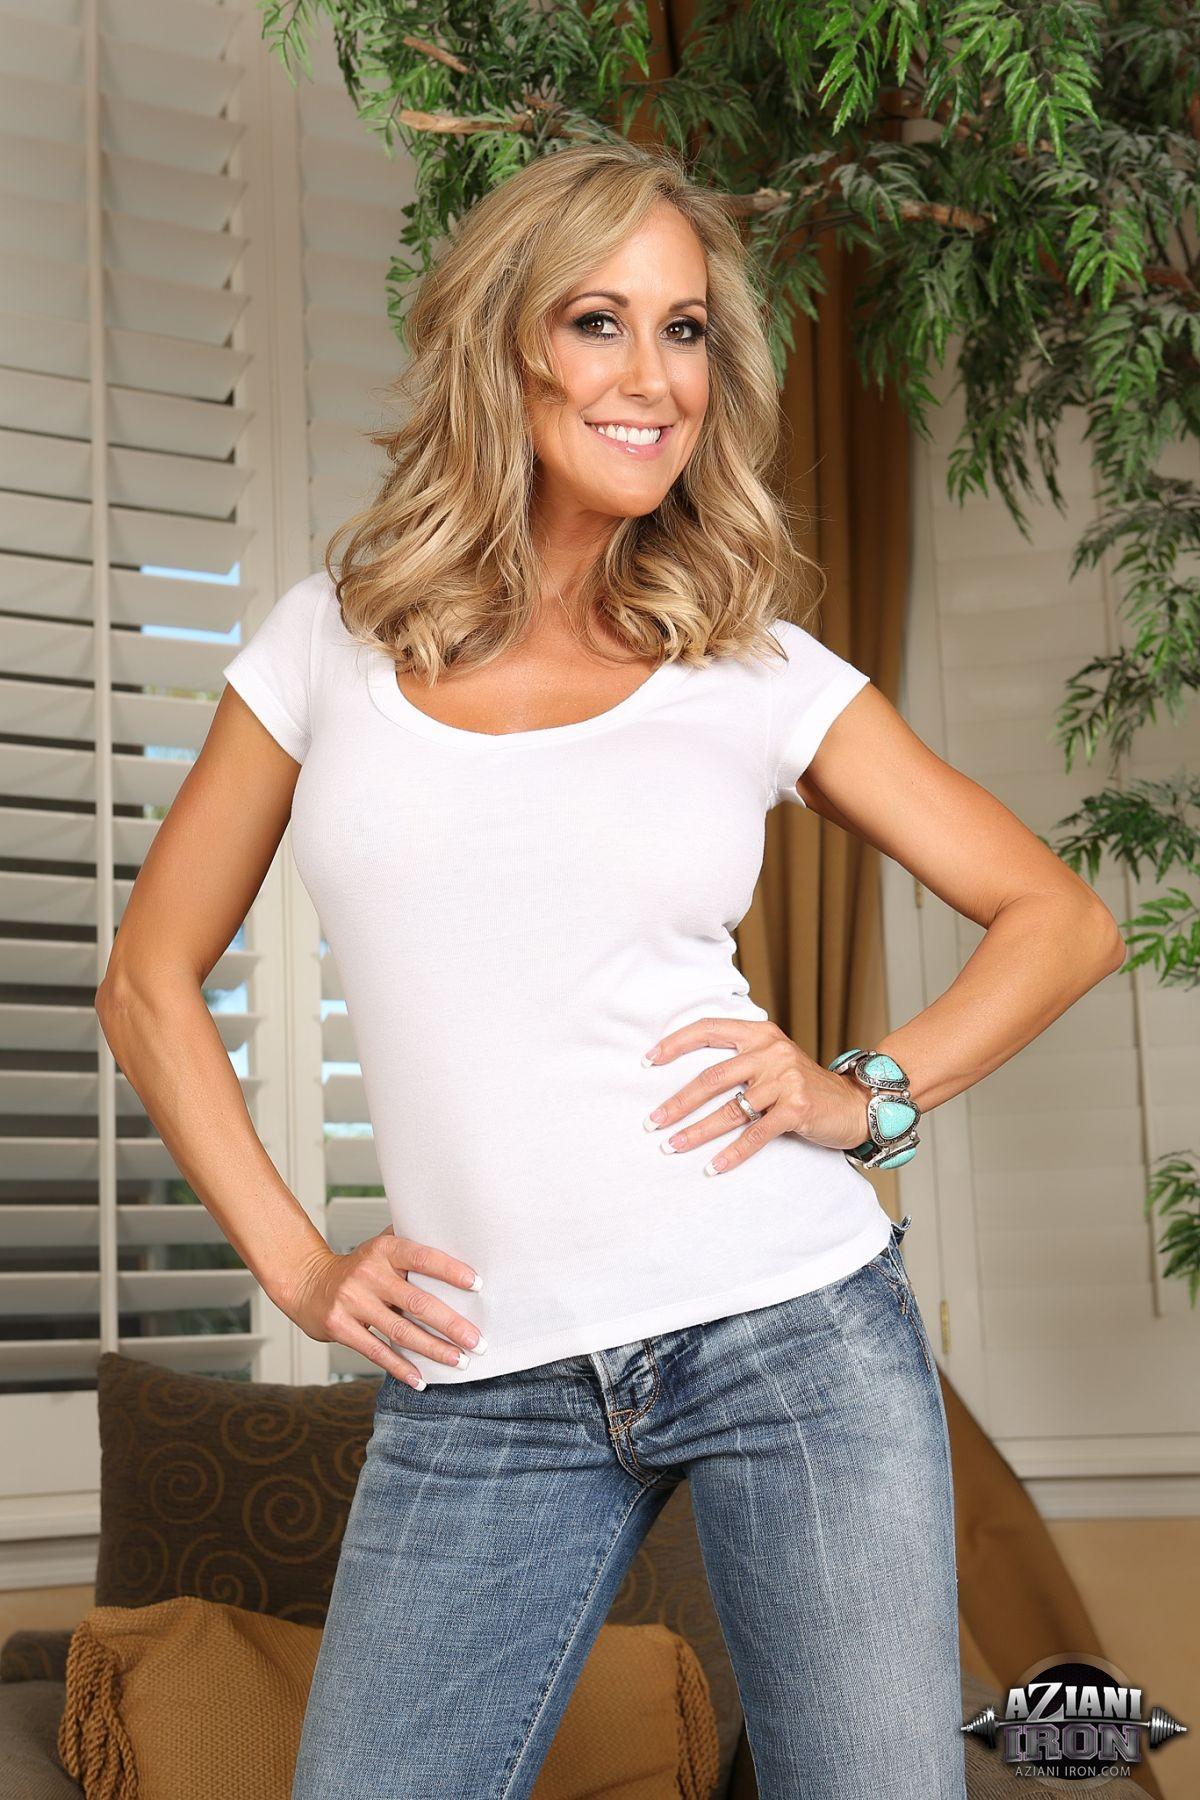 Wallpaper : model, blonde, long hair, portrait display